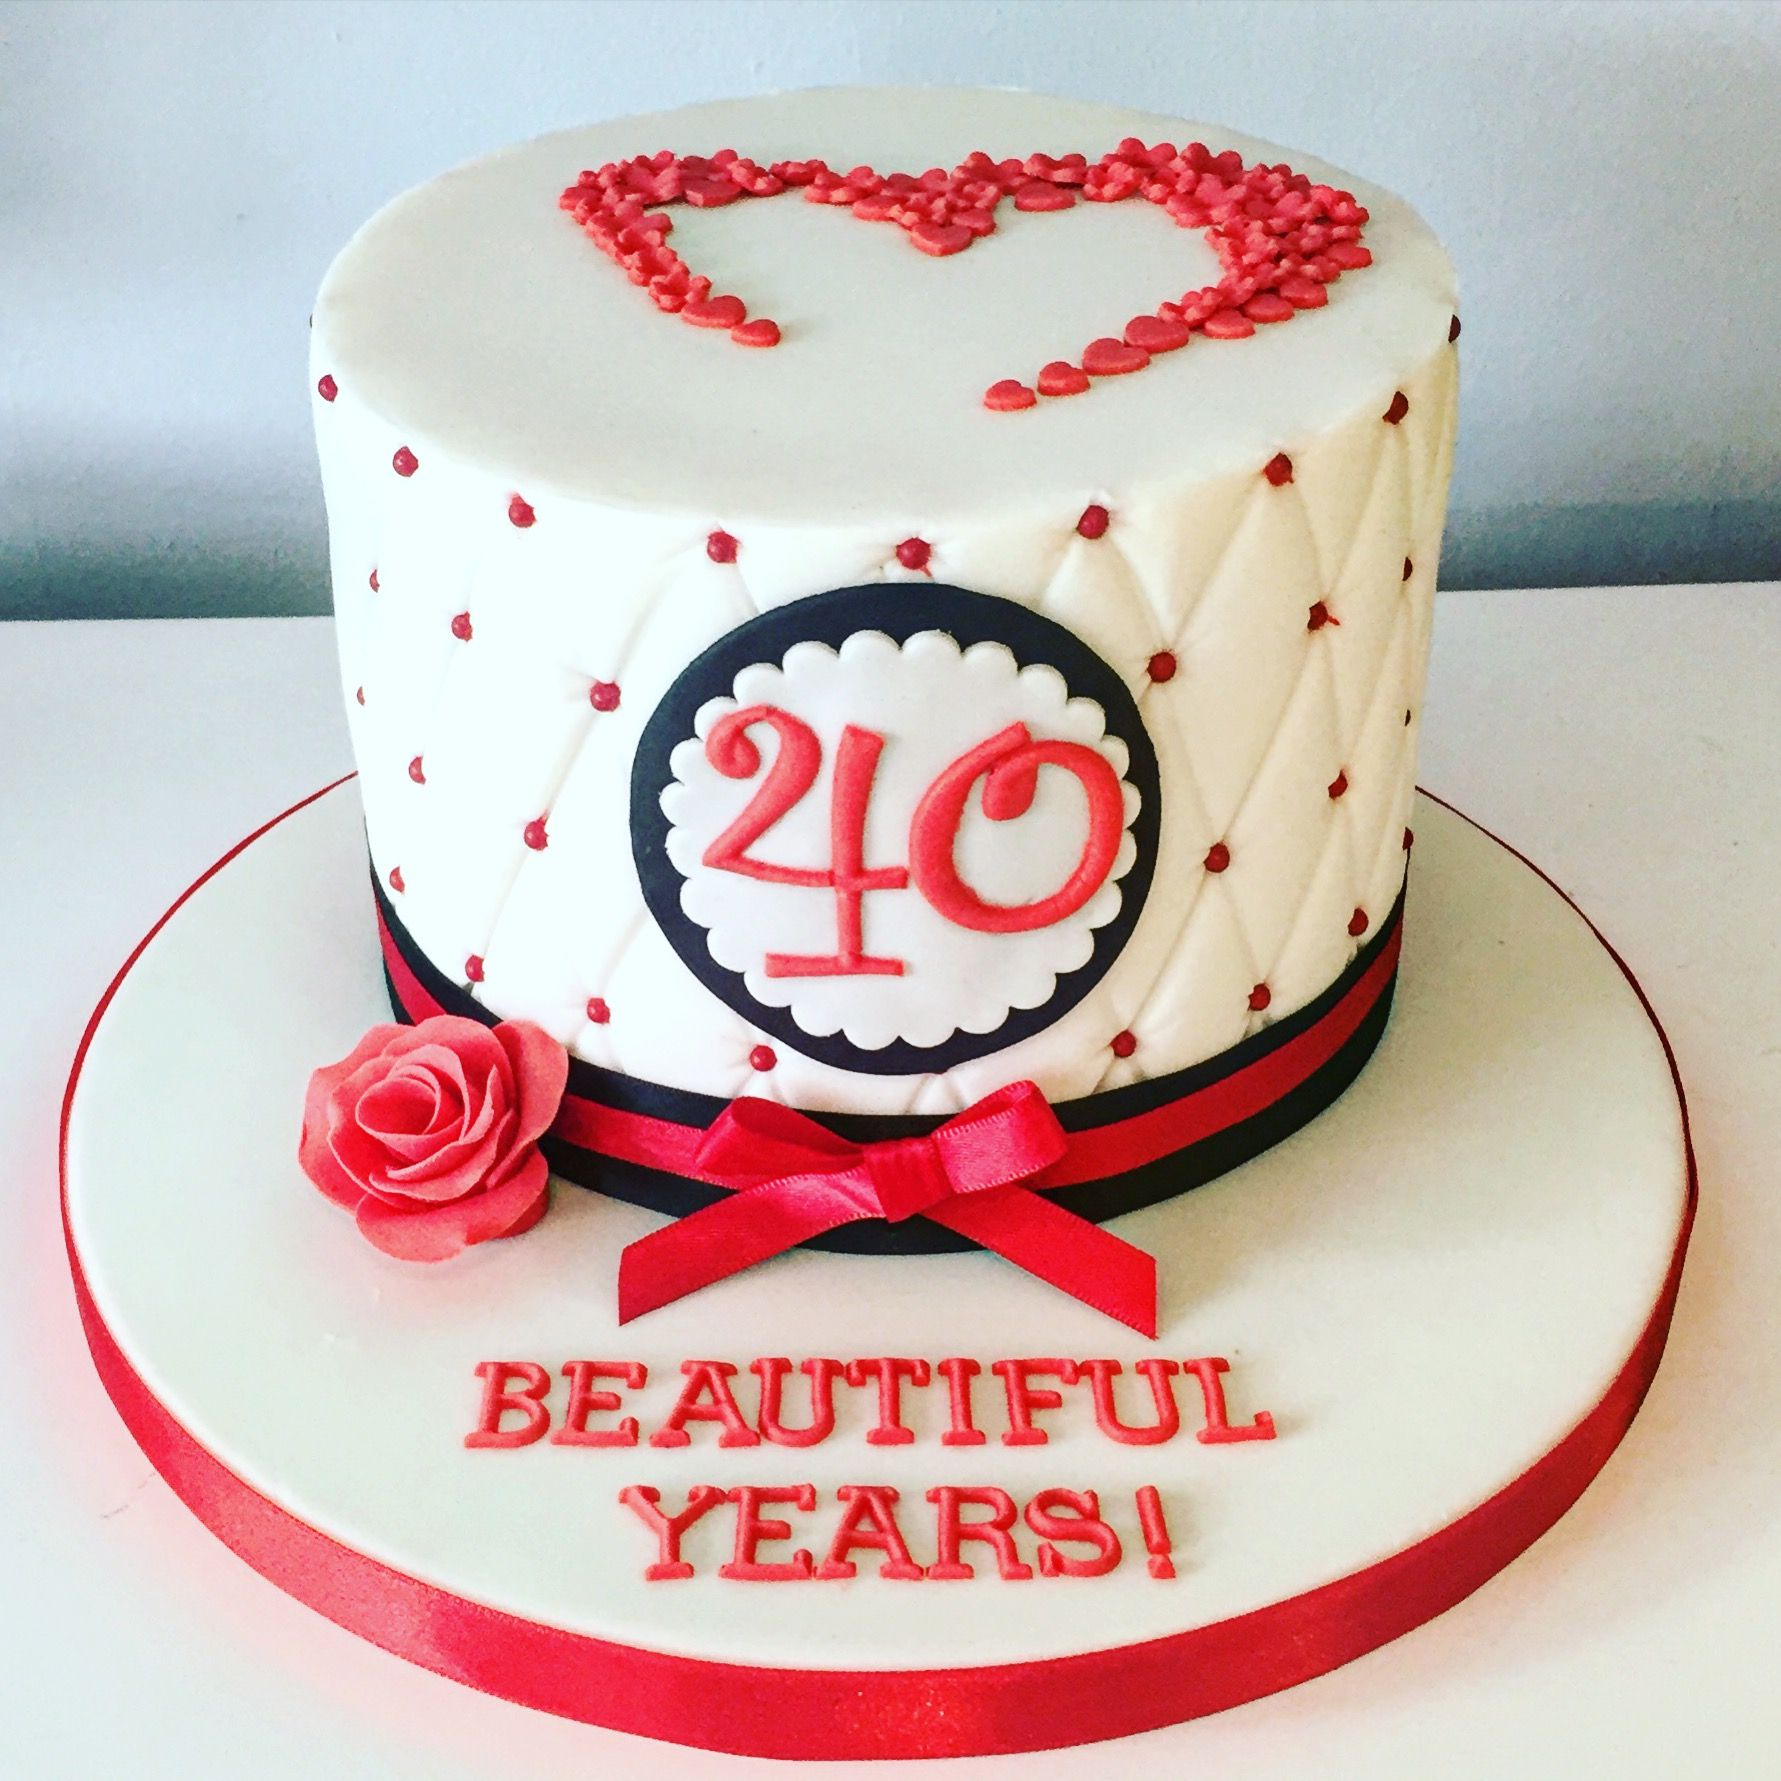 Red Velvet Ruby Anniversary Cake Newleafpastries Com